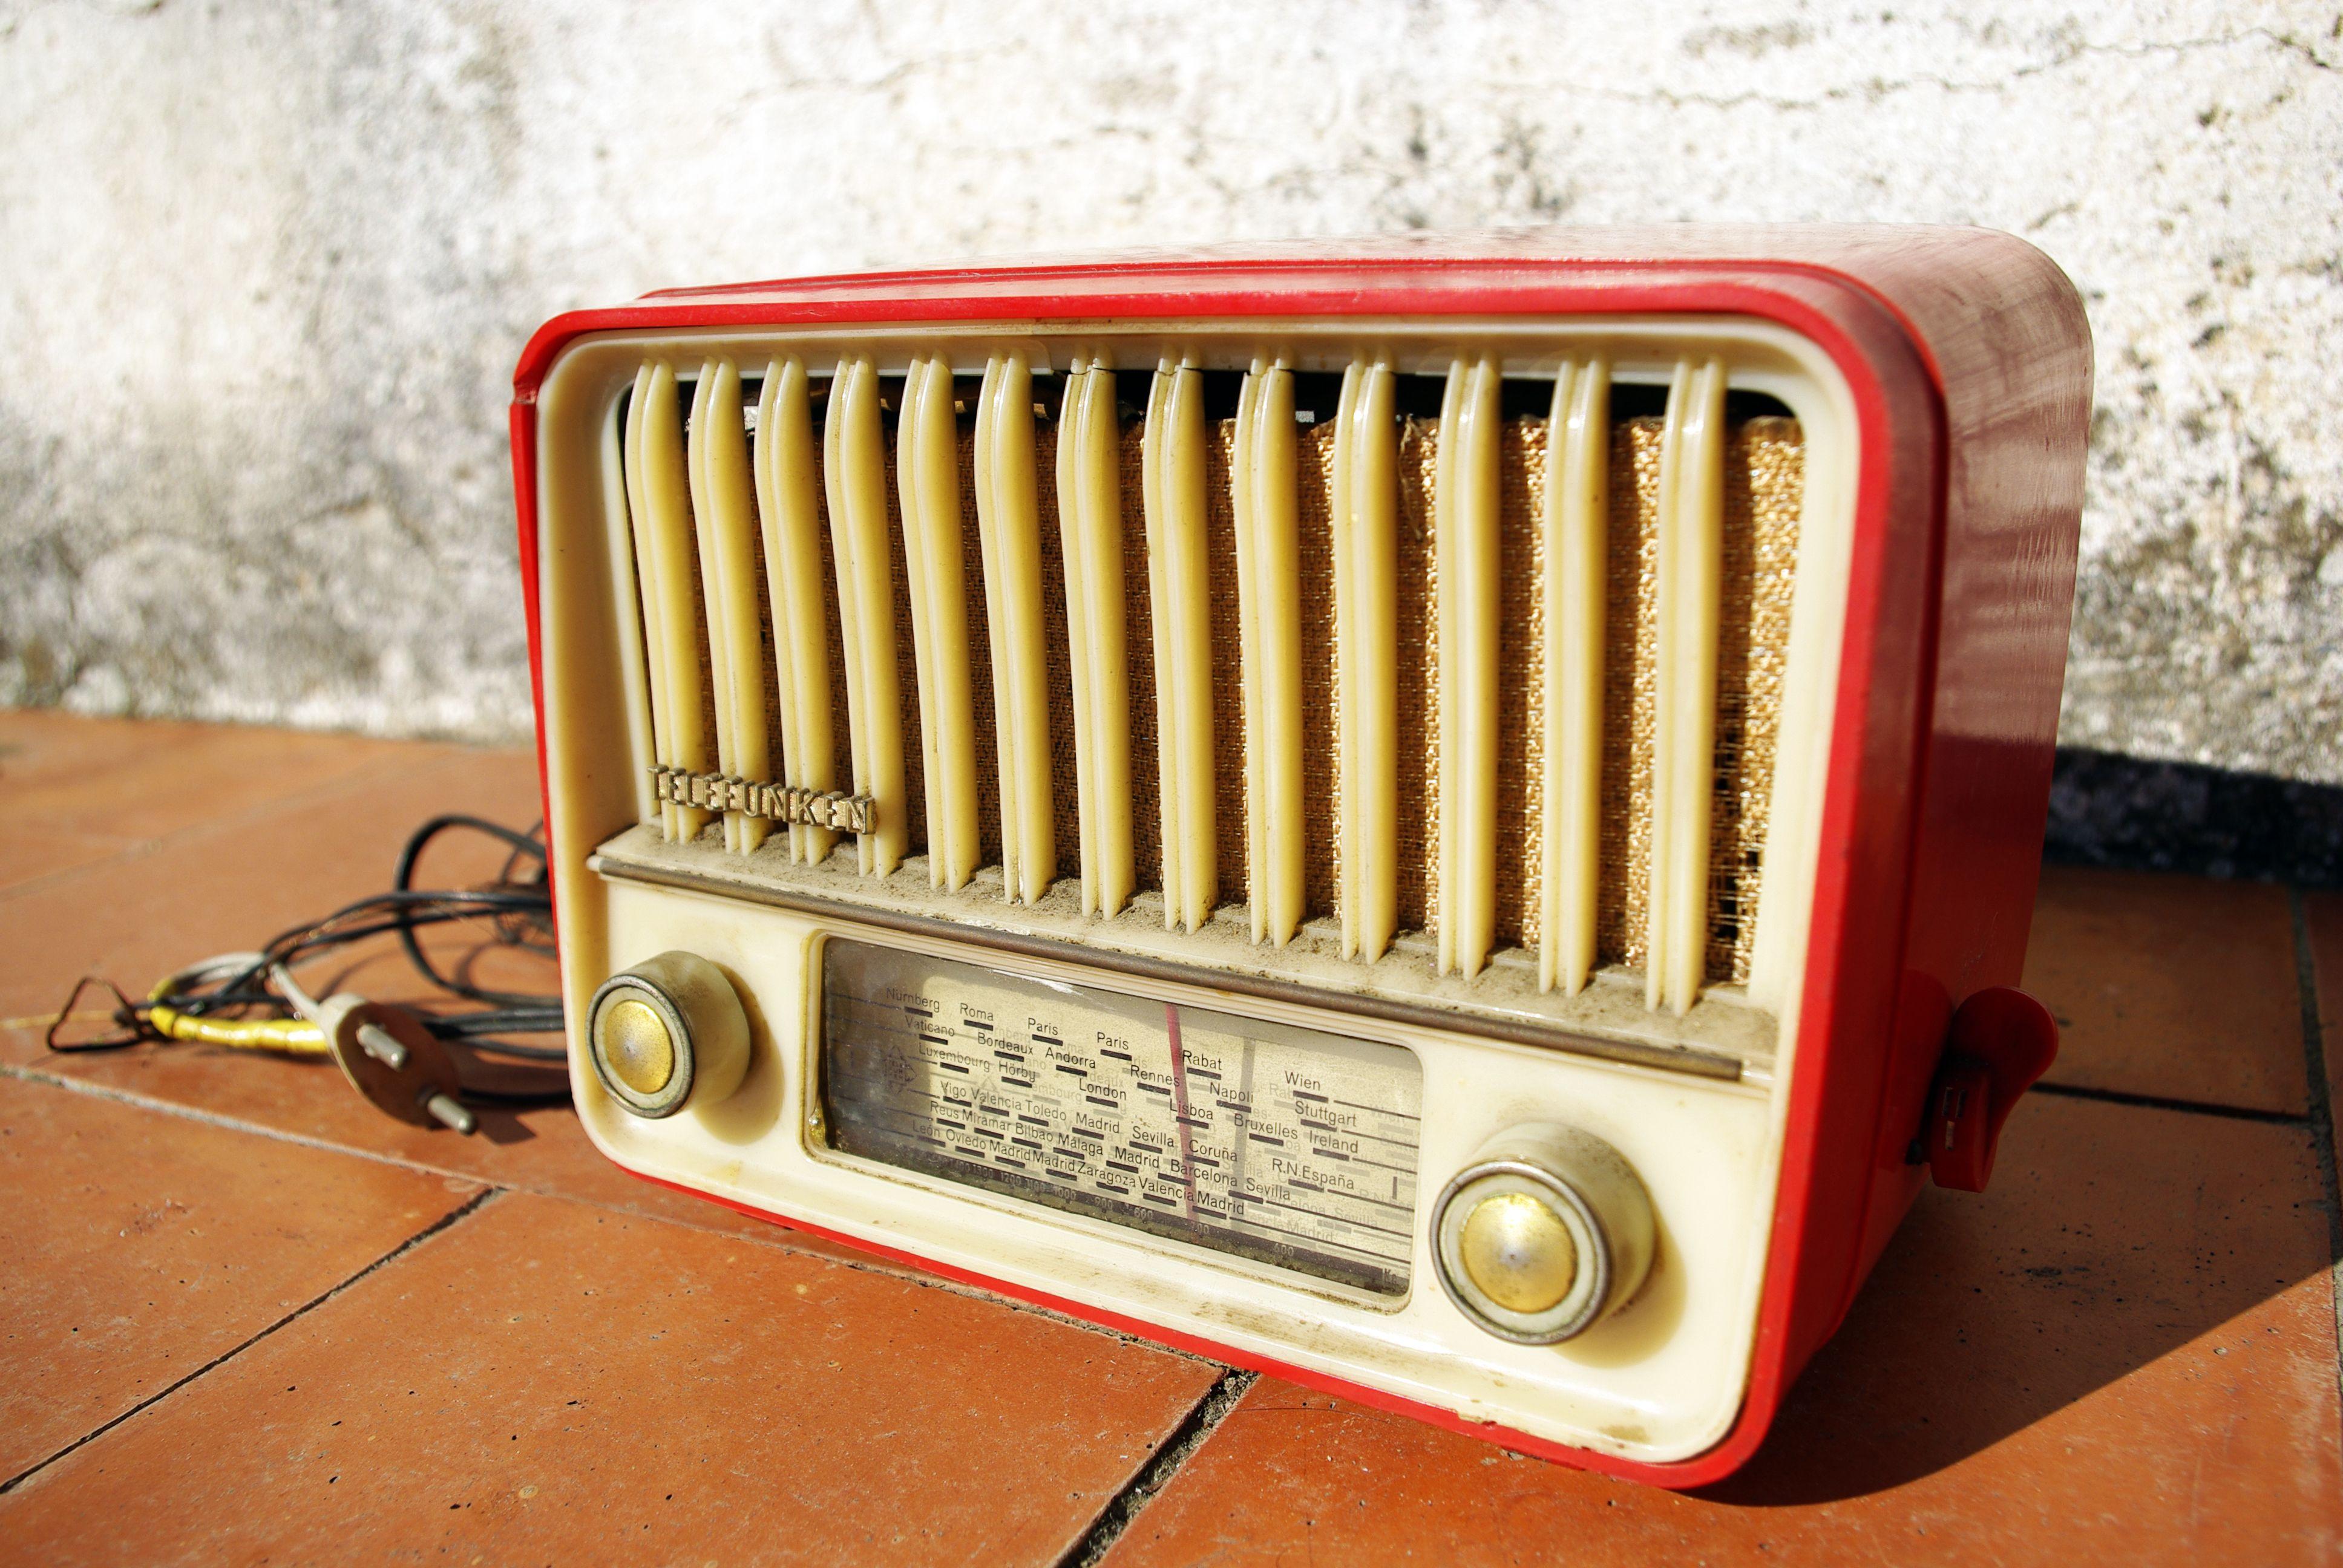 Ràdio vella Telefunken / Old Telefunken radio